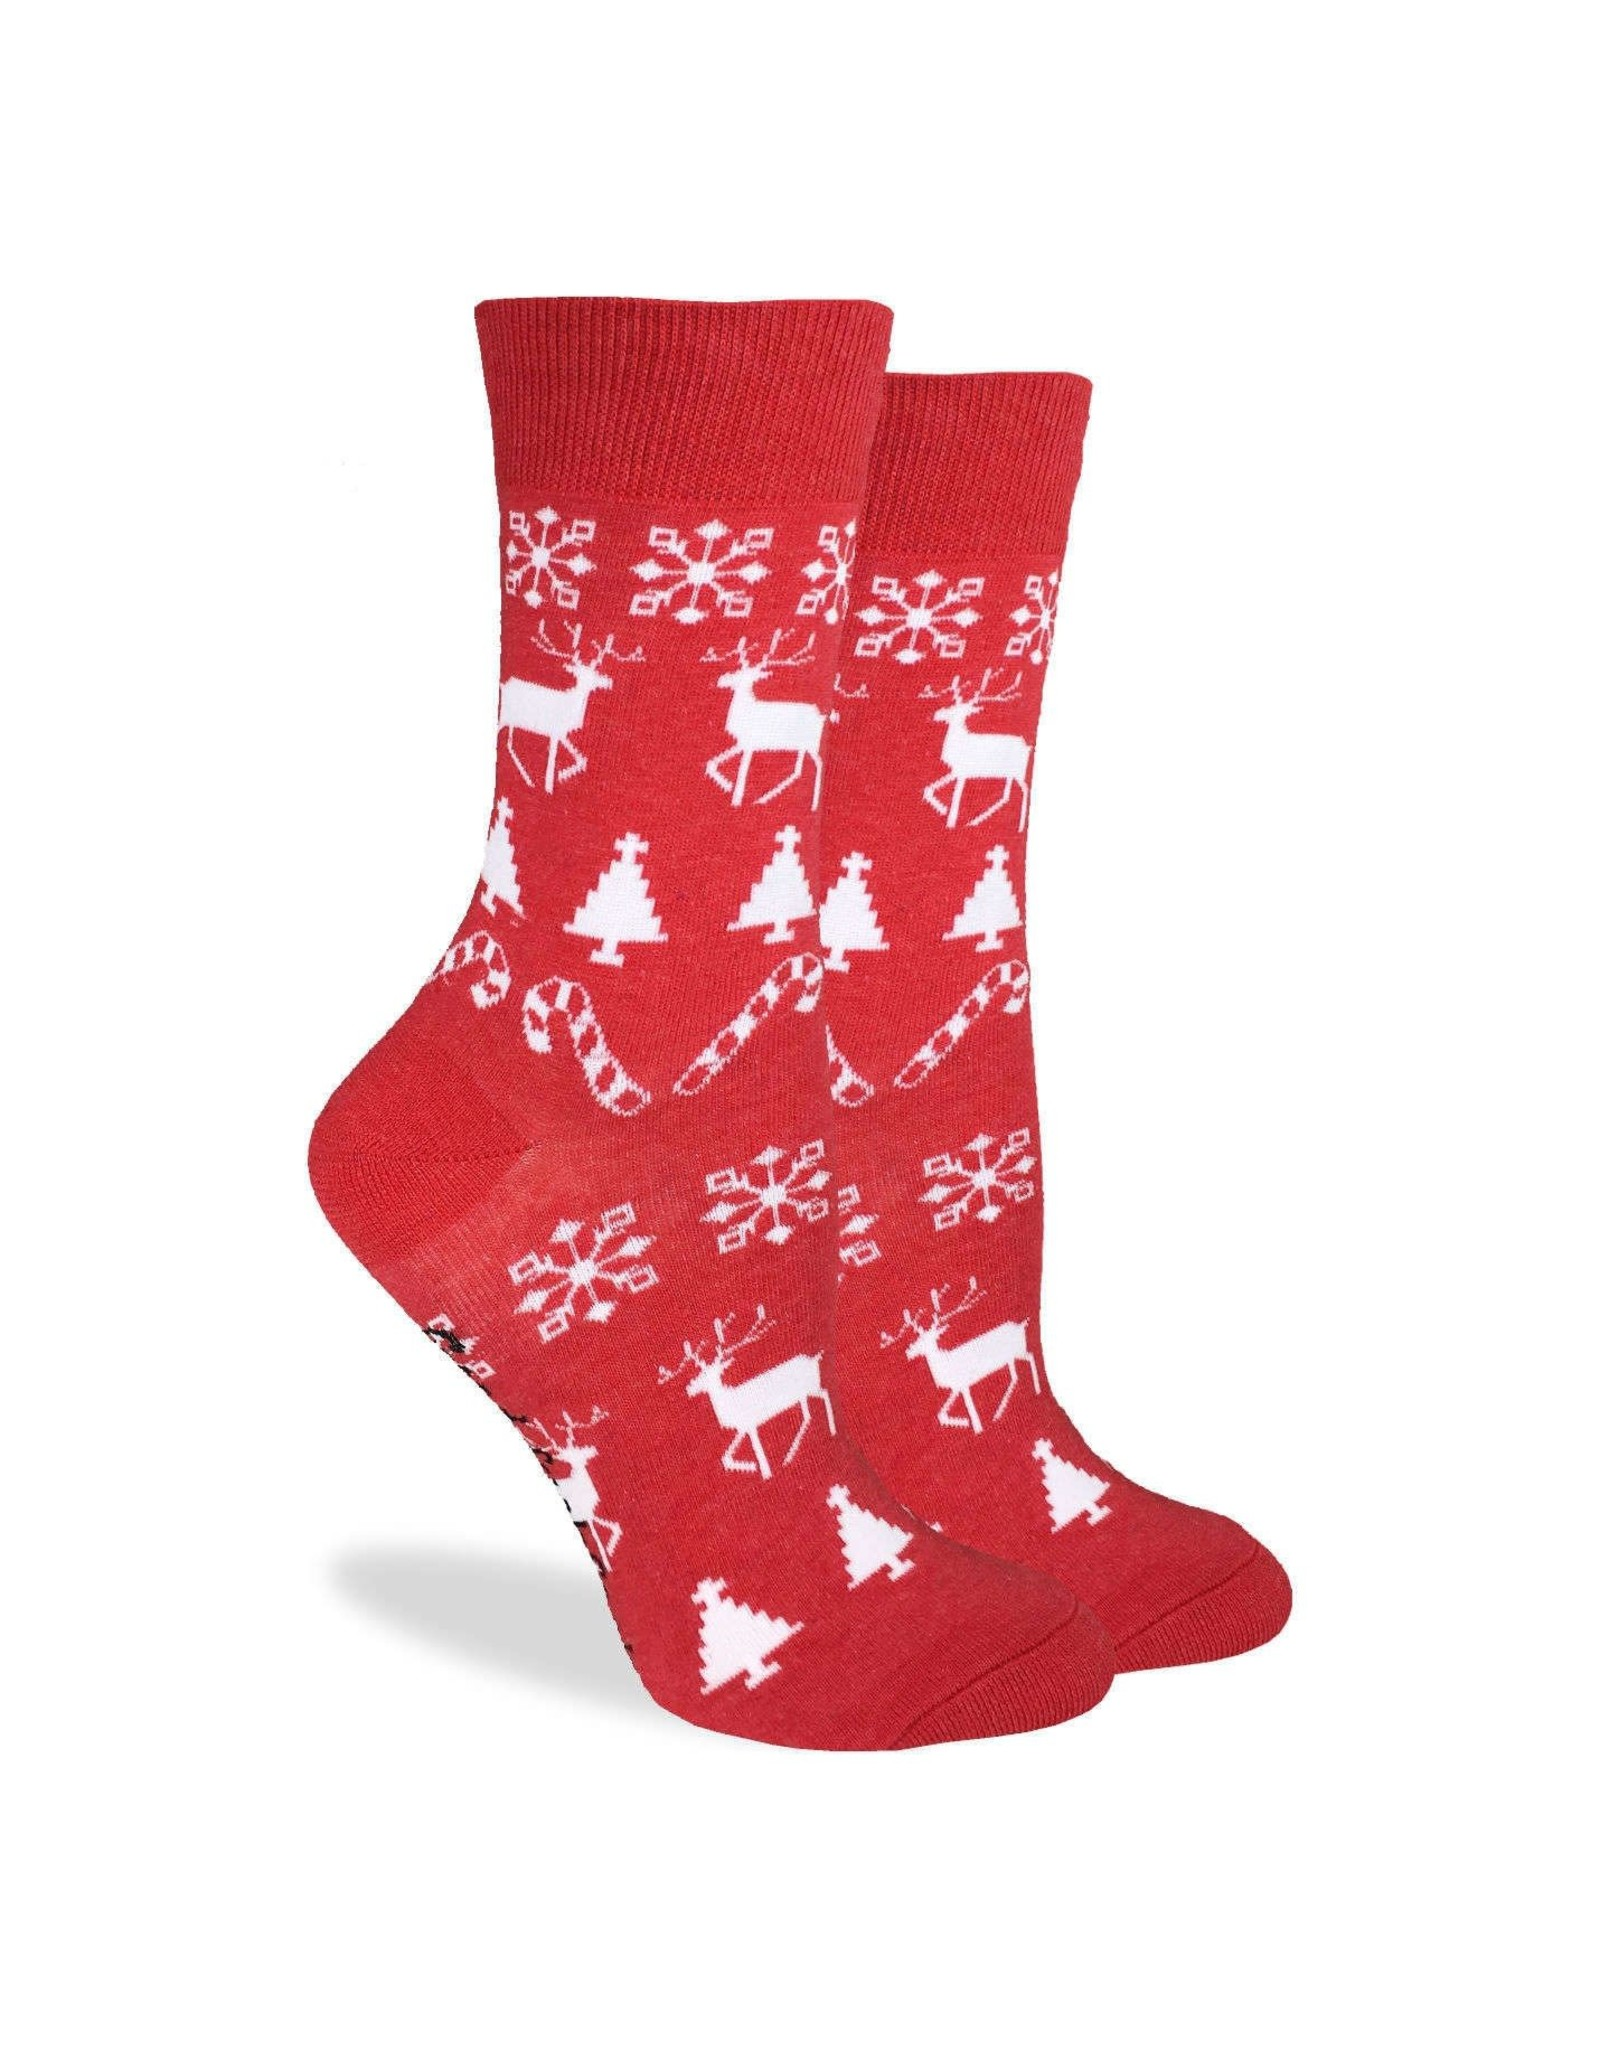 Good Luck Sock Women's Christmas Holiday Socks